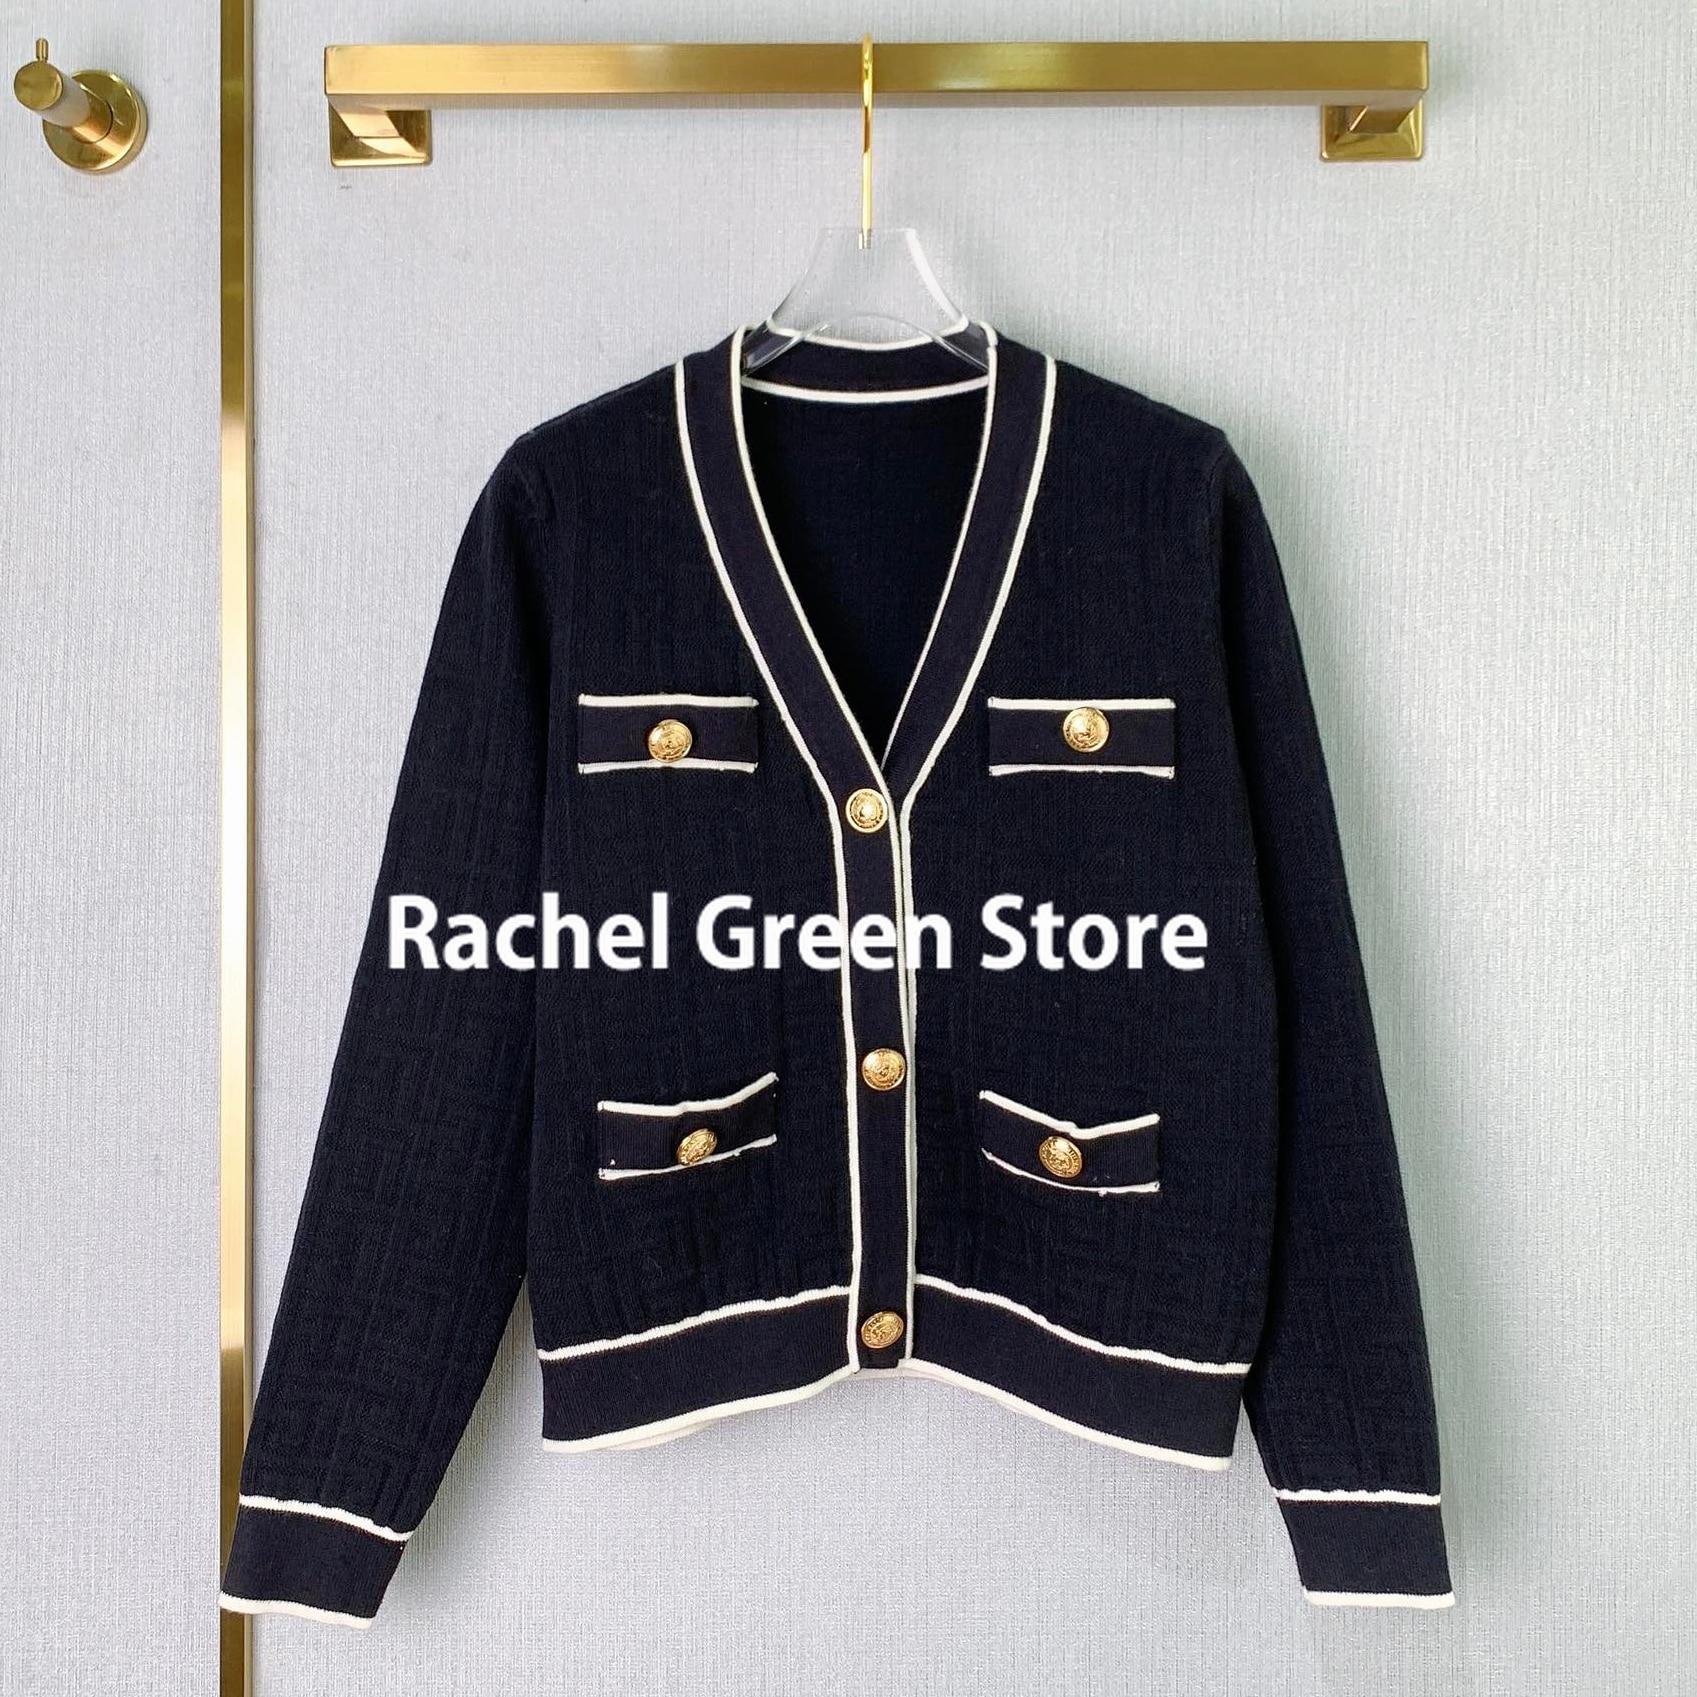 Luxury Designer women branded Maze Series 2021 Autumn Contrast Color Gold Buttos V-neck wool Blended knitted sweater cardigans enlarge